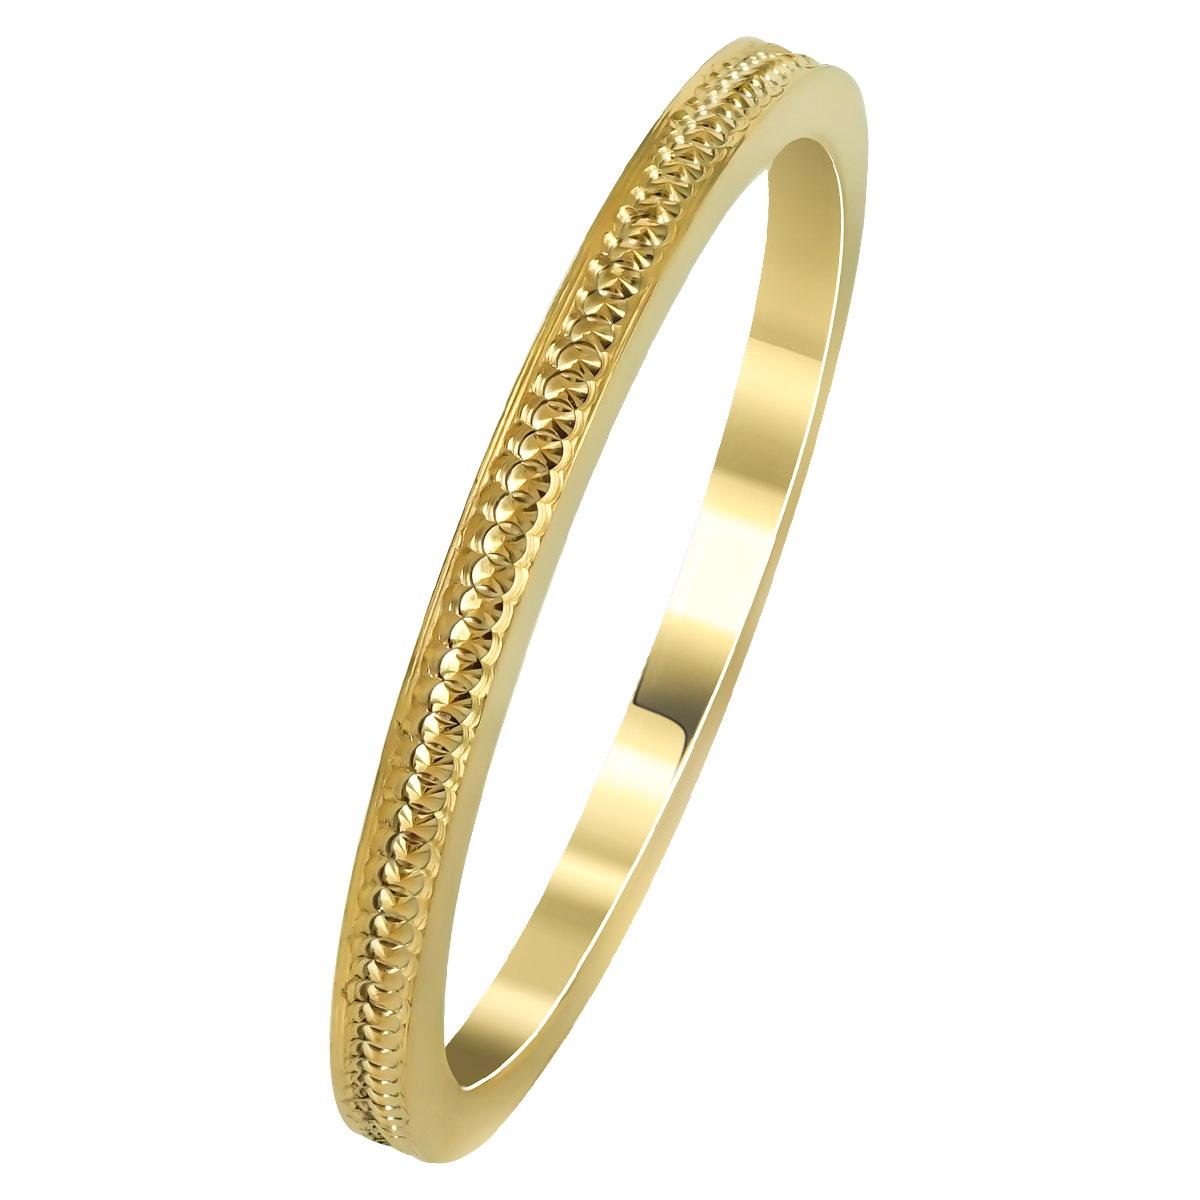 Kίτρινη Χρυσή Βέρα Γάμου WR259 k14